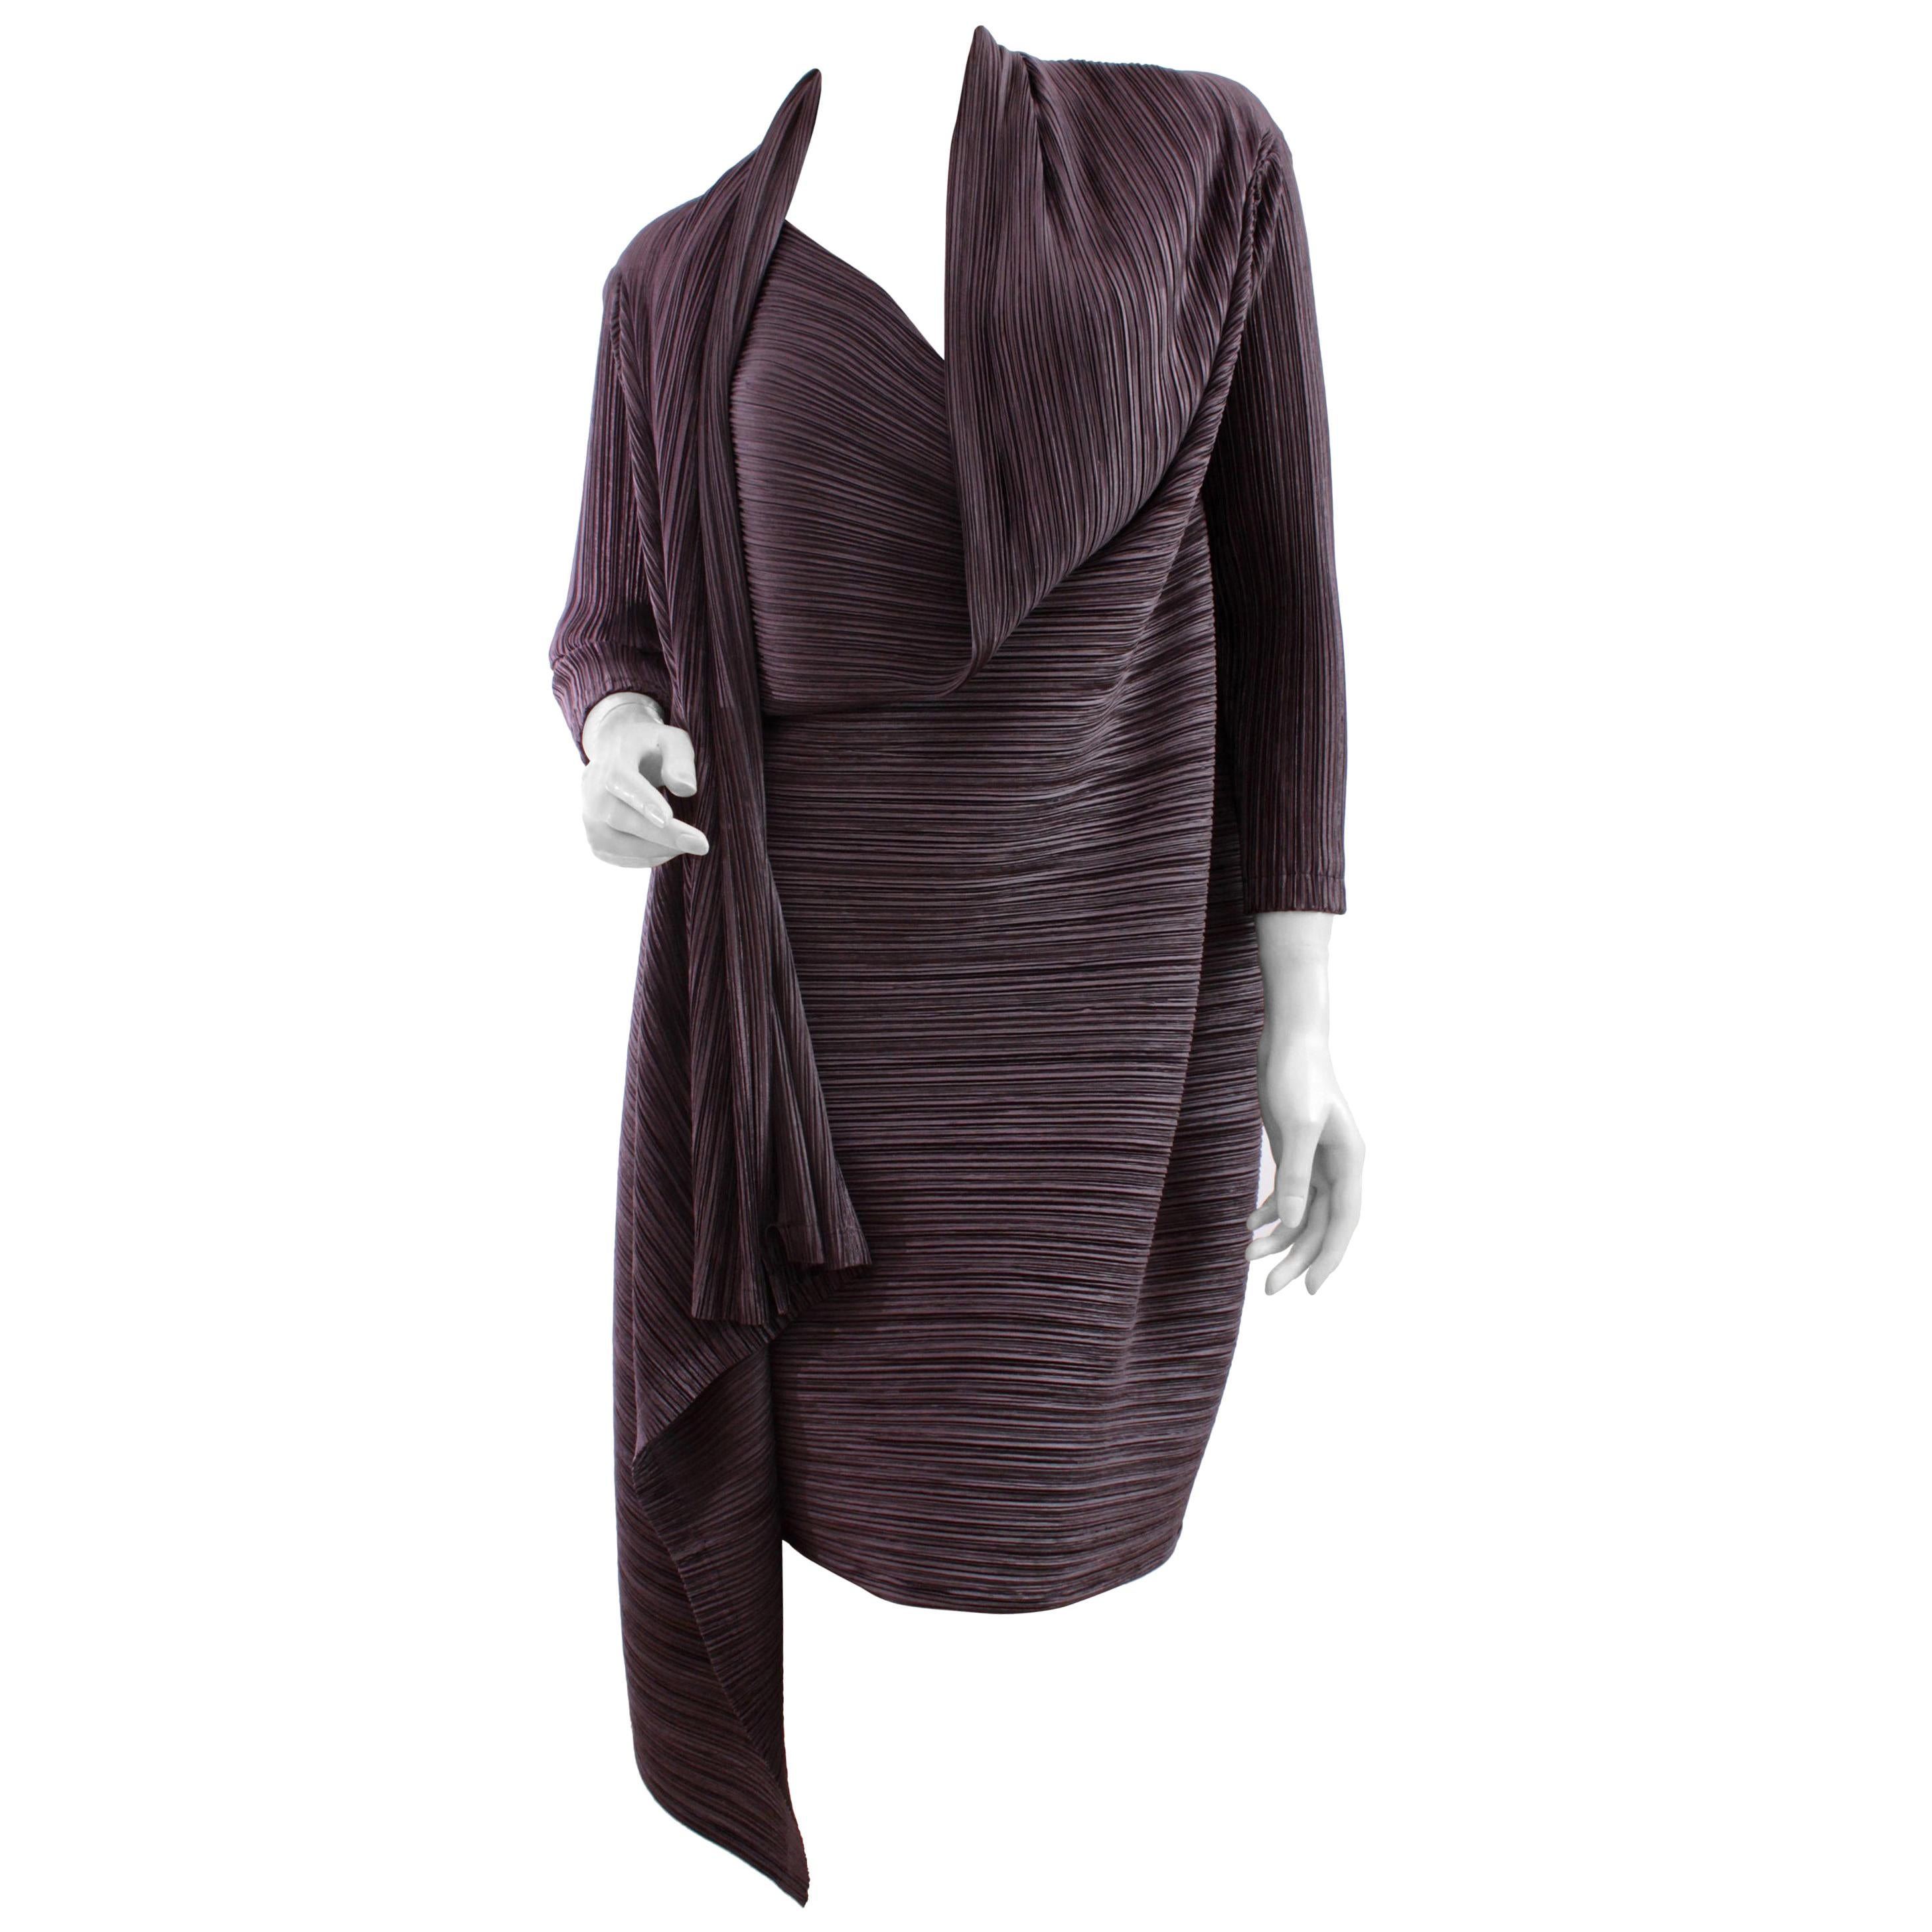 Issey Miyake Jacket Long Pleated Vintage Sz S/M